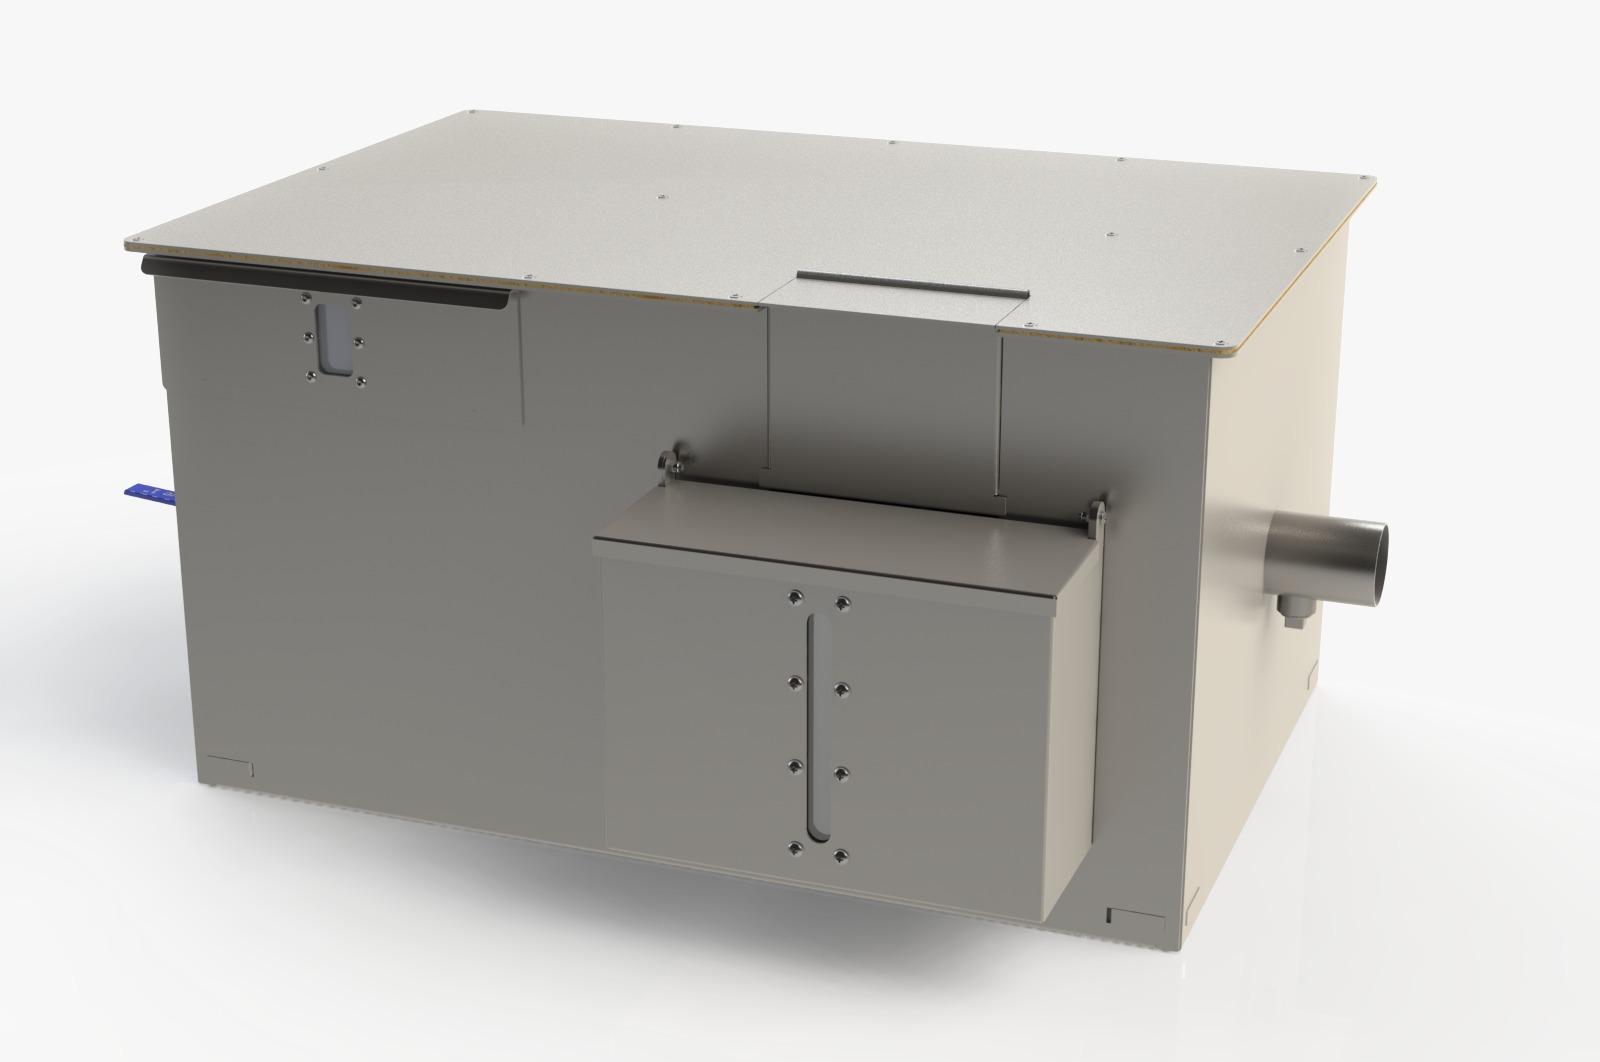 HC2 Grease removal unit - Fog Fellow Designs LTD